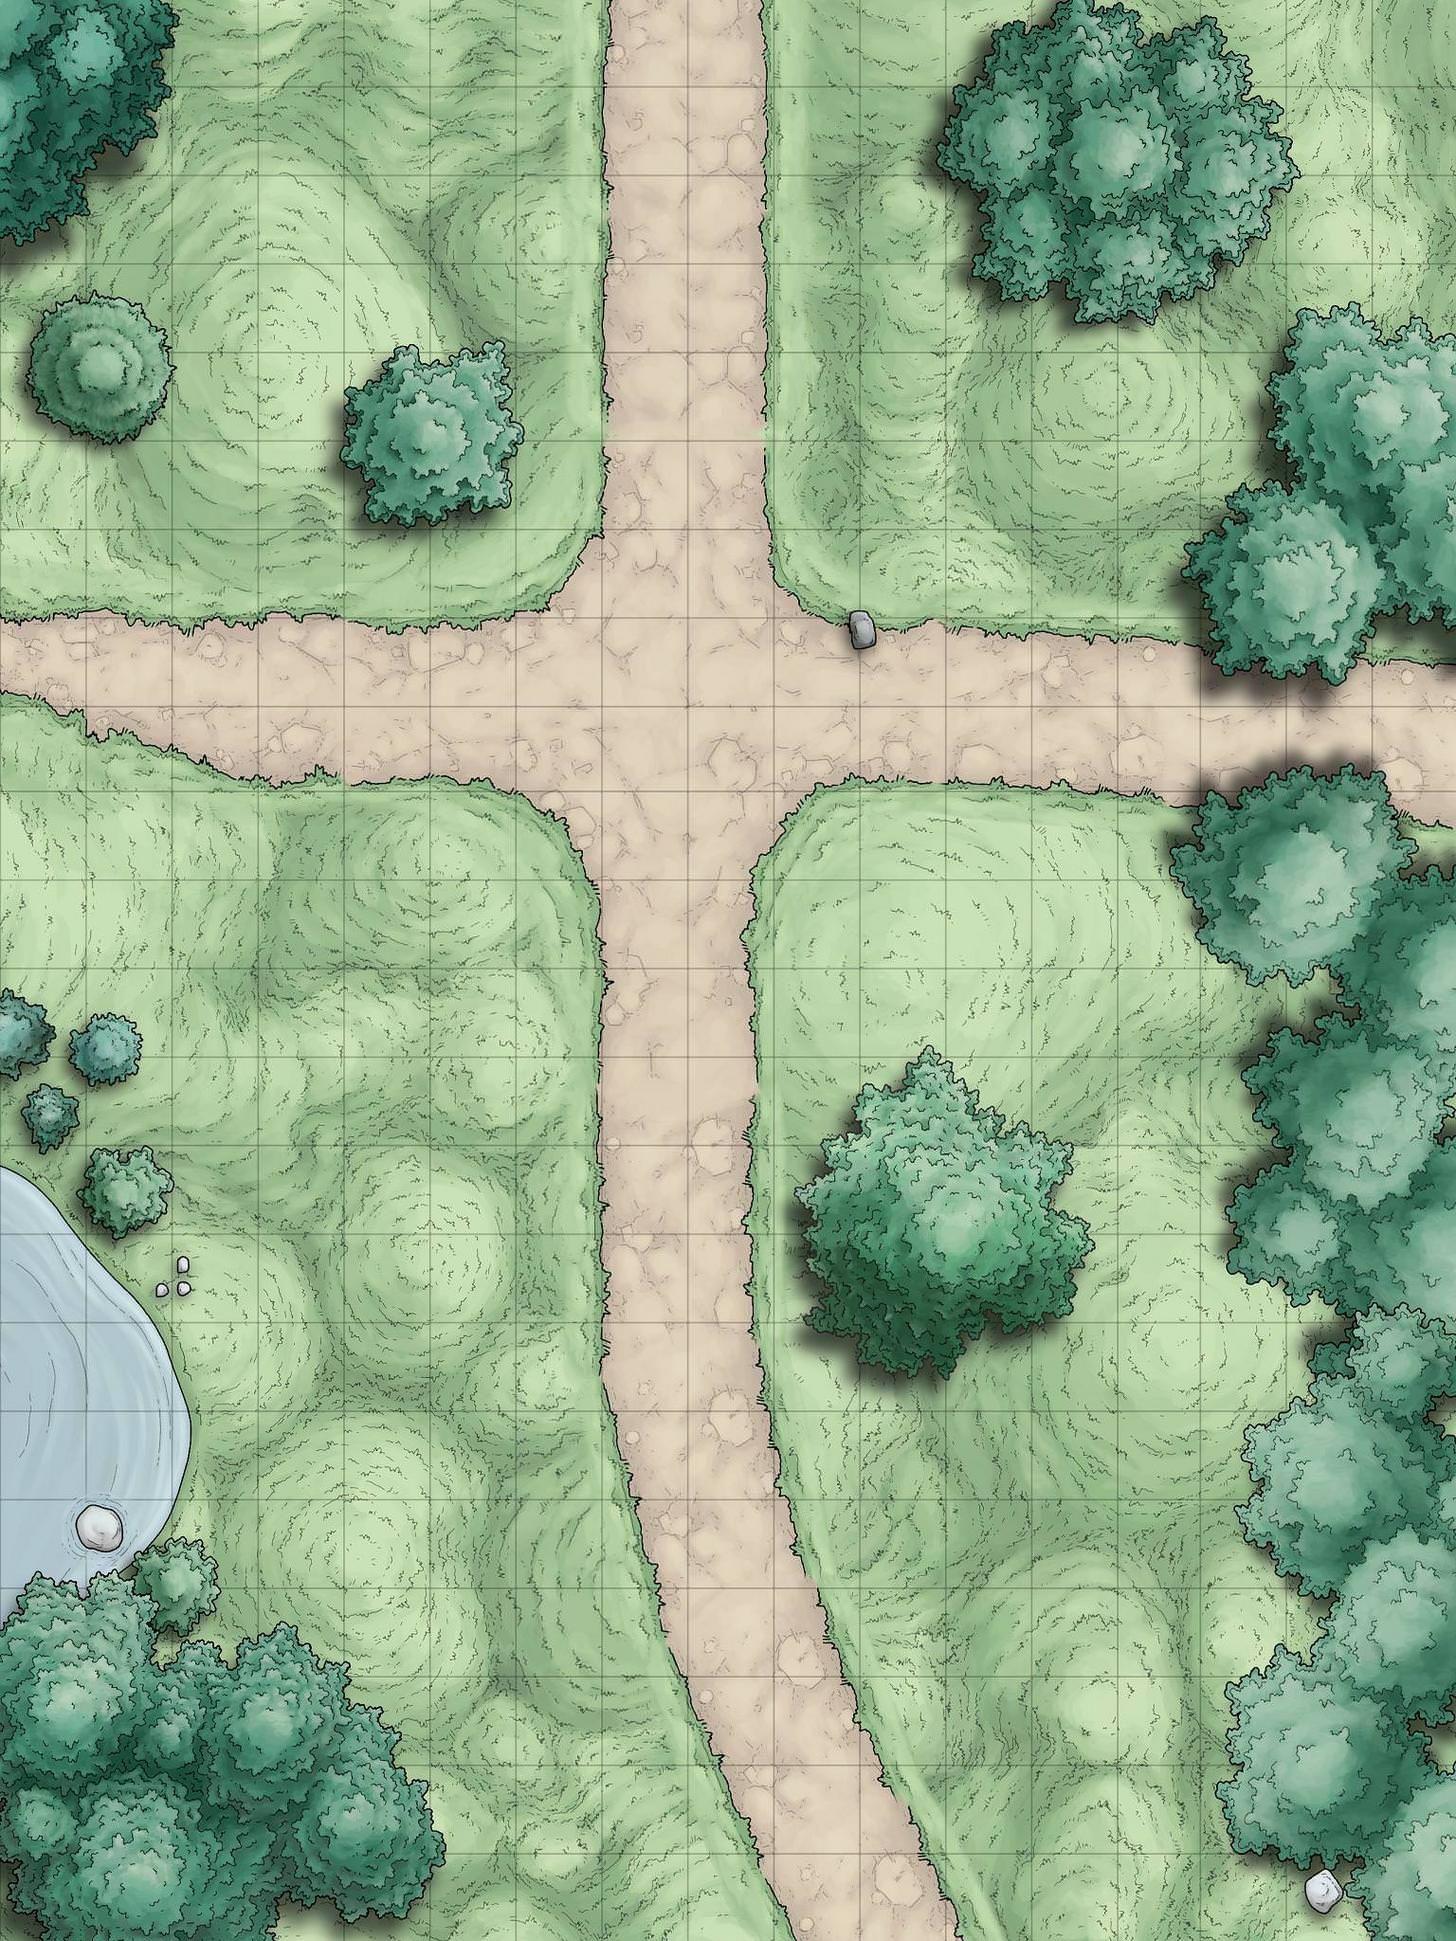 Random Encounter Battle Maps